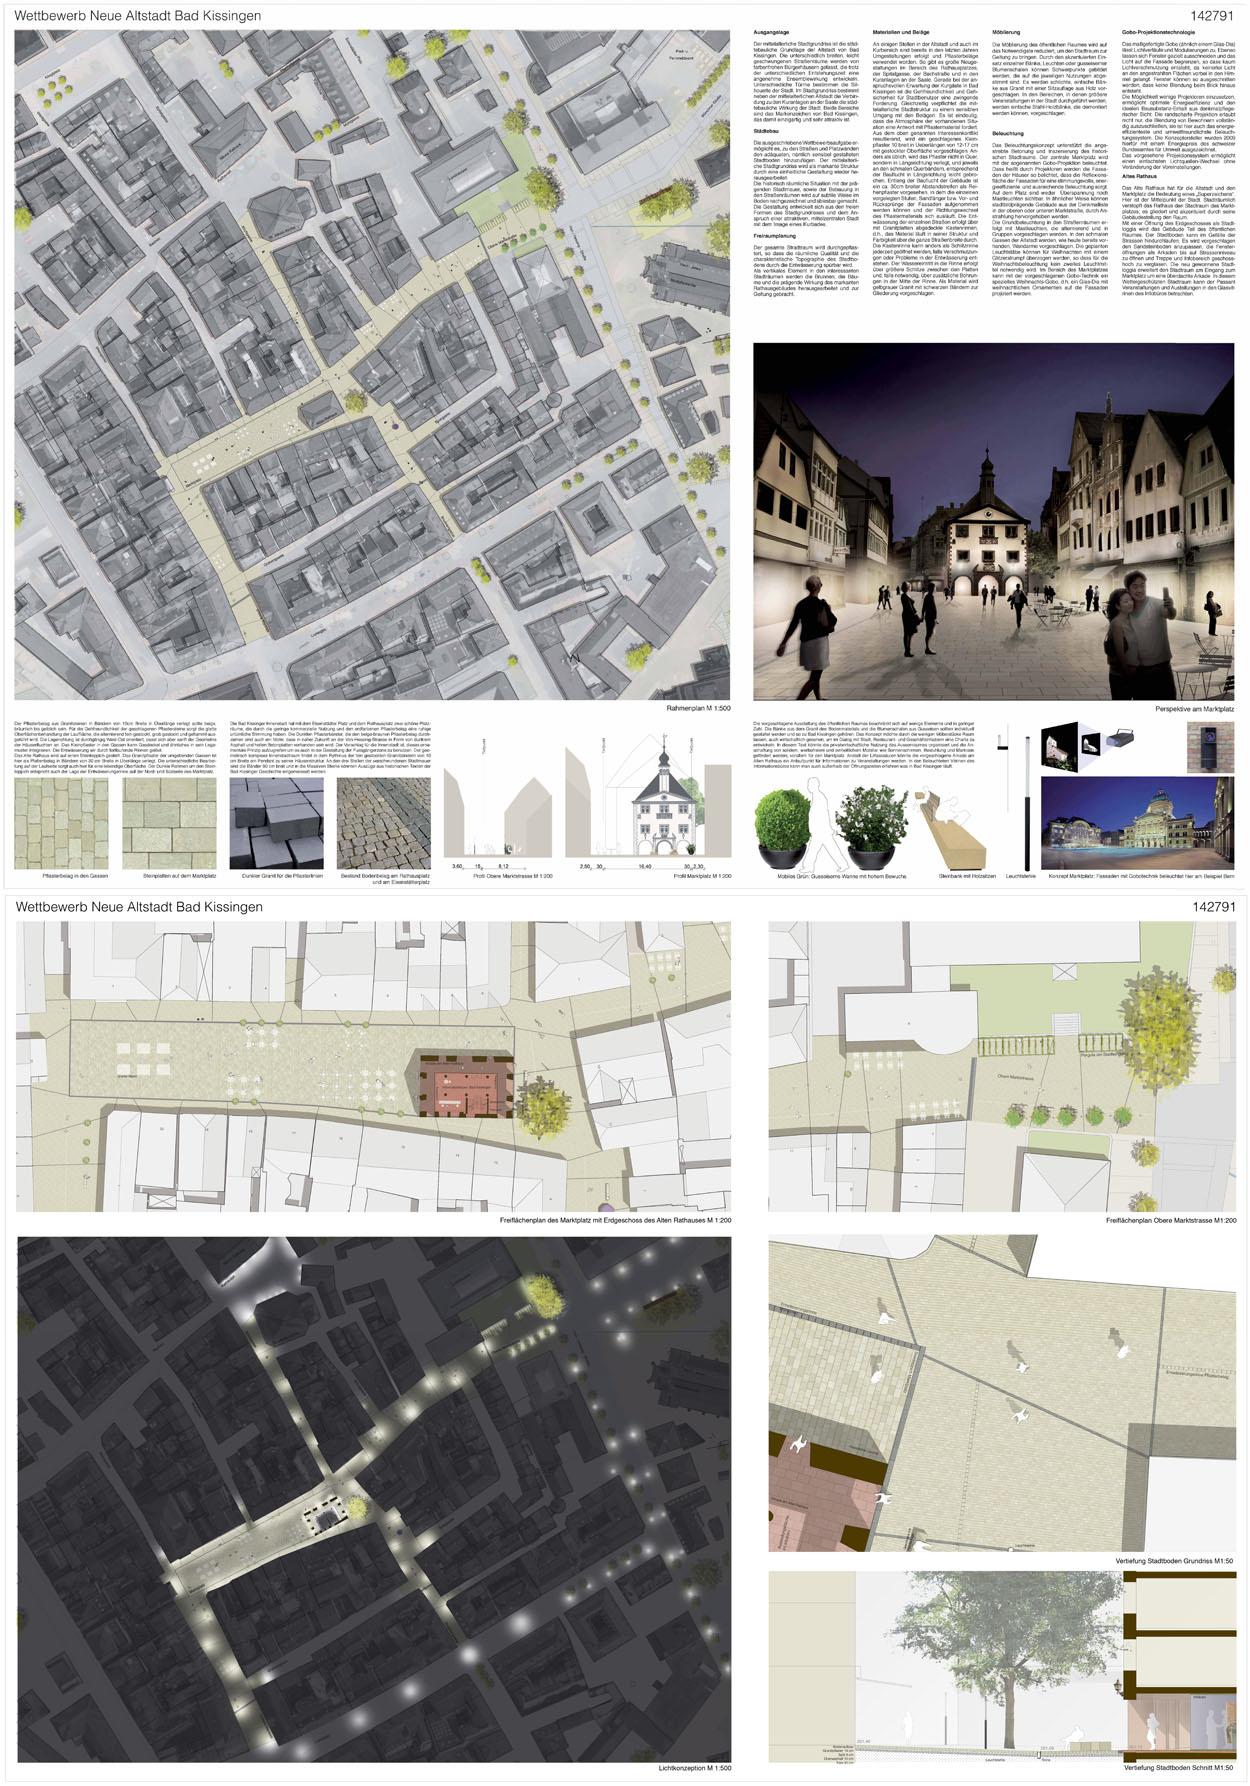 WBB Neue Altstadt Bad Kissingen Rosenstiel architekten